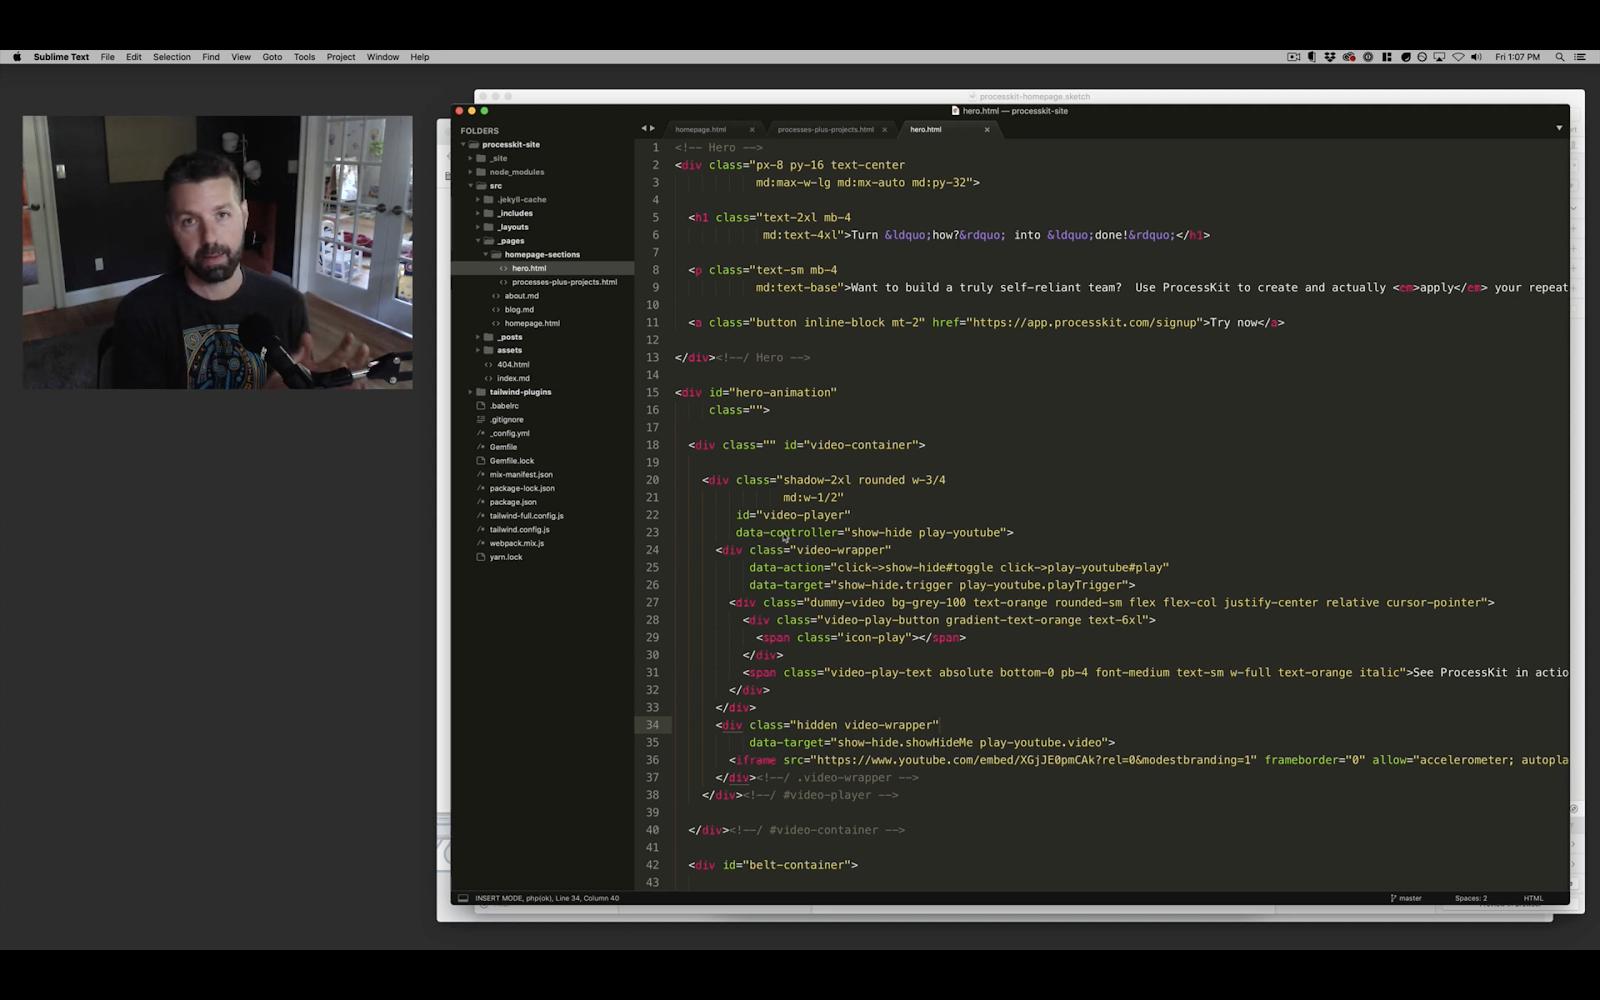 ProcessKit's Code